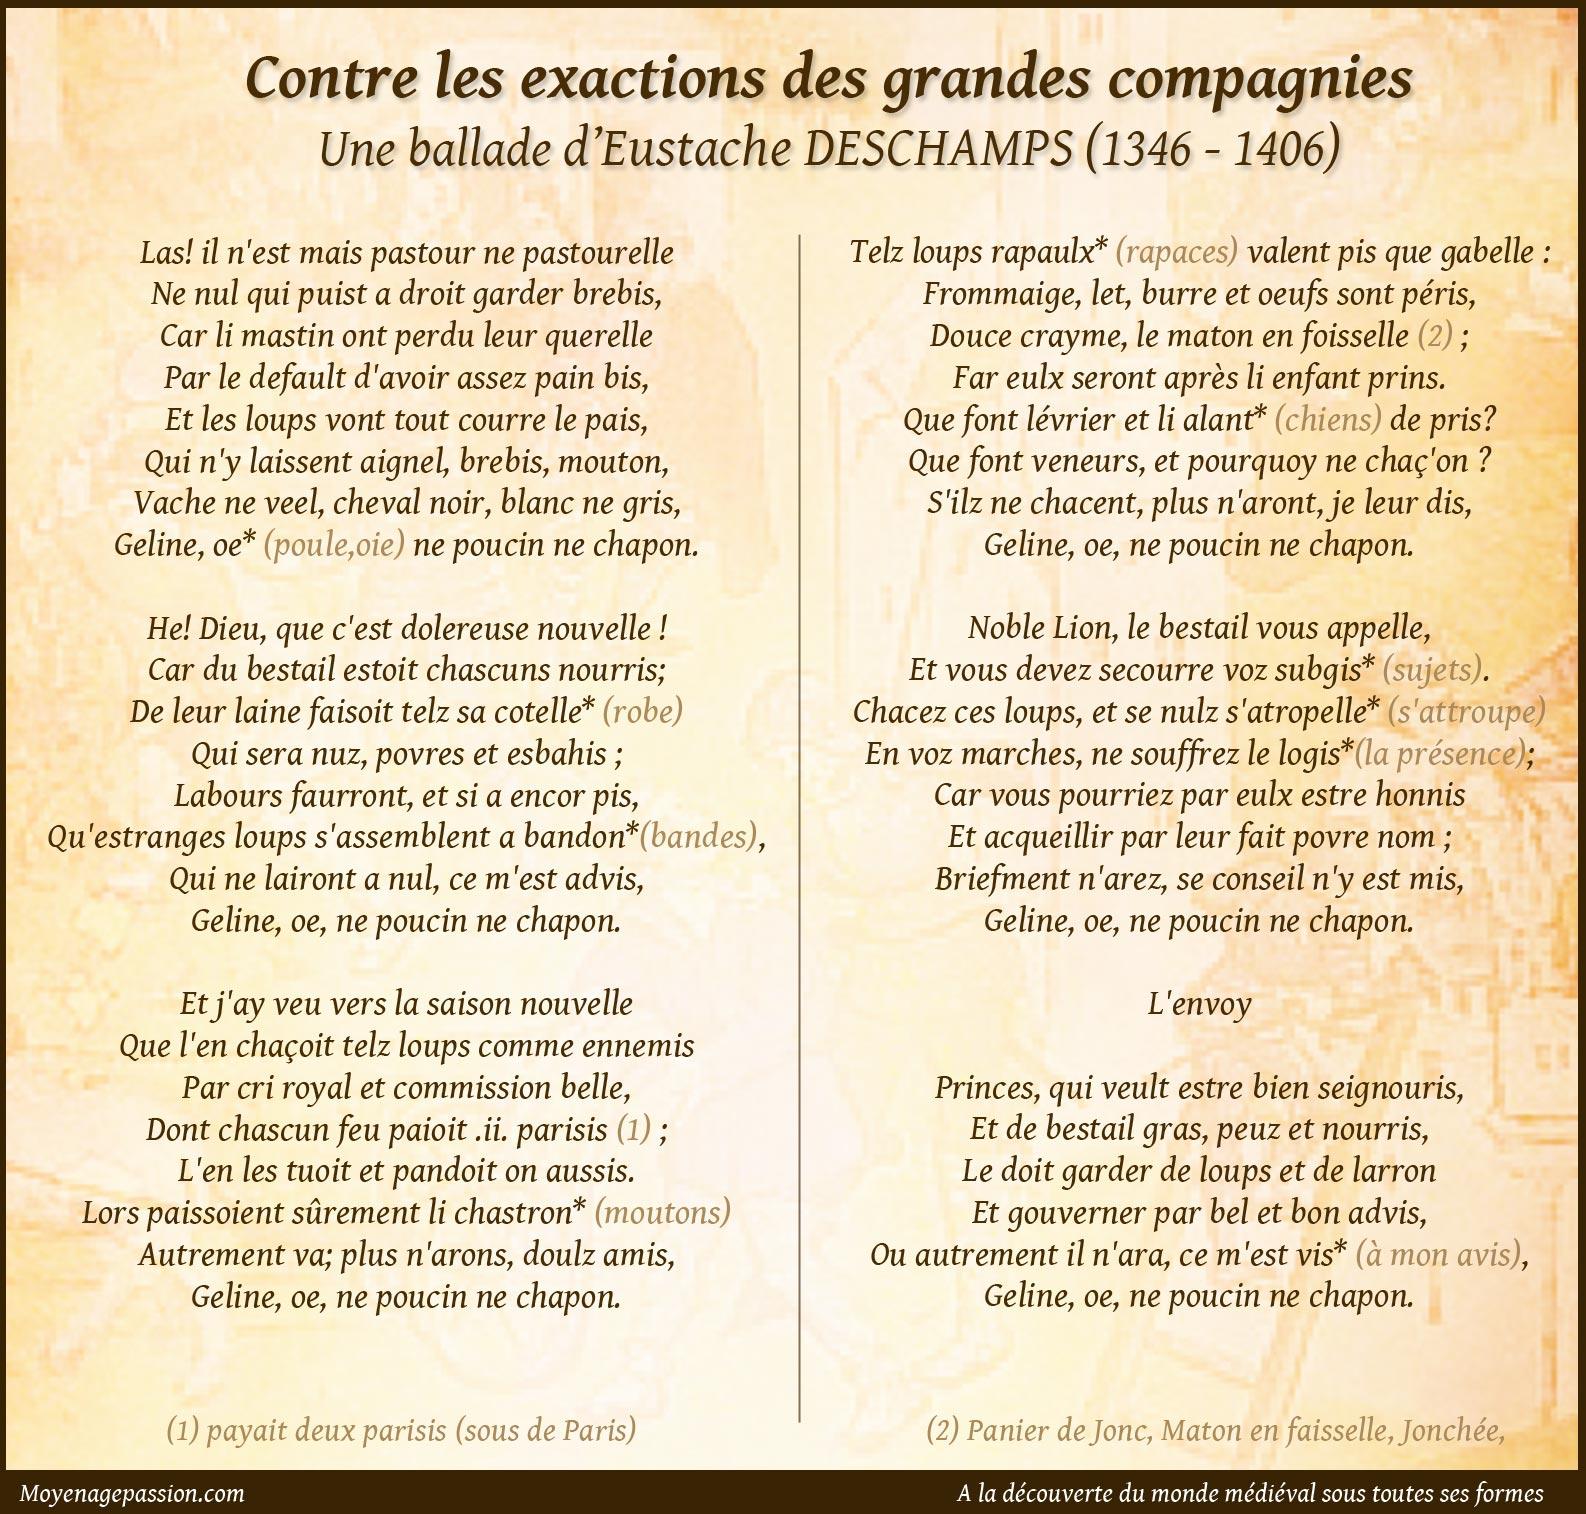 eustache_deschamps_poesie_moyen-age_ballade_medievale_routiers_grandes_compagnies